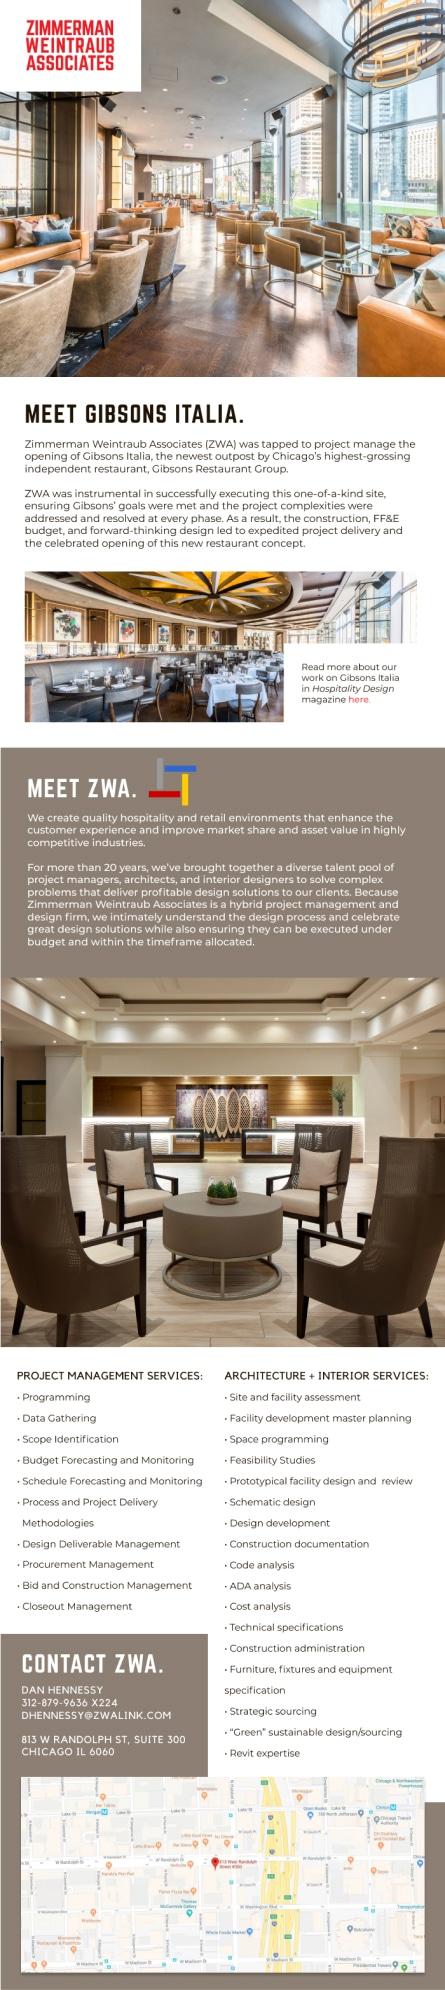 Zwa Interior Architectural Design Email Marketing Case Study